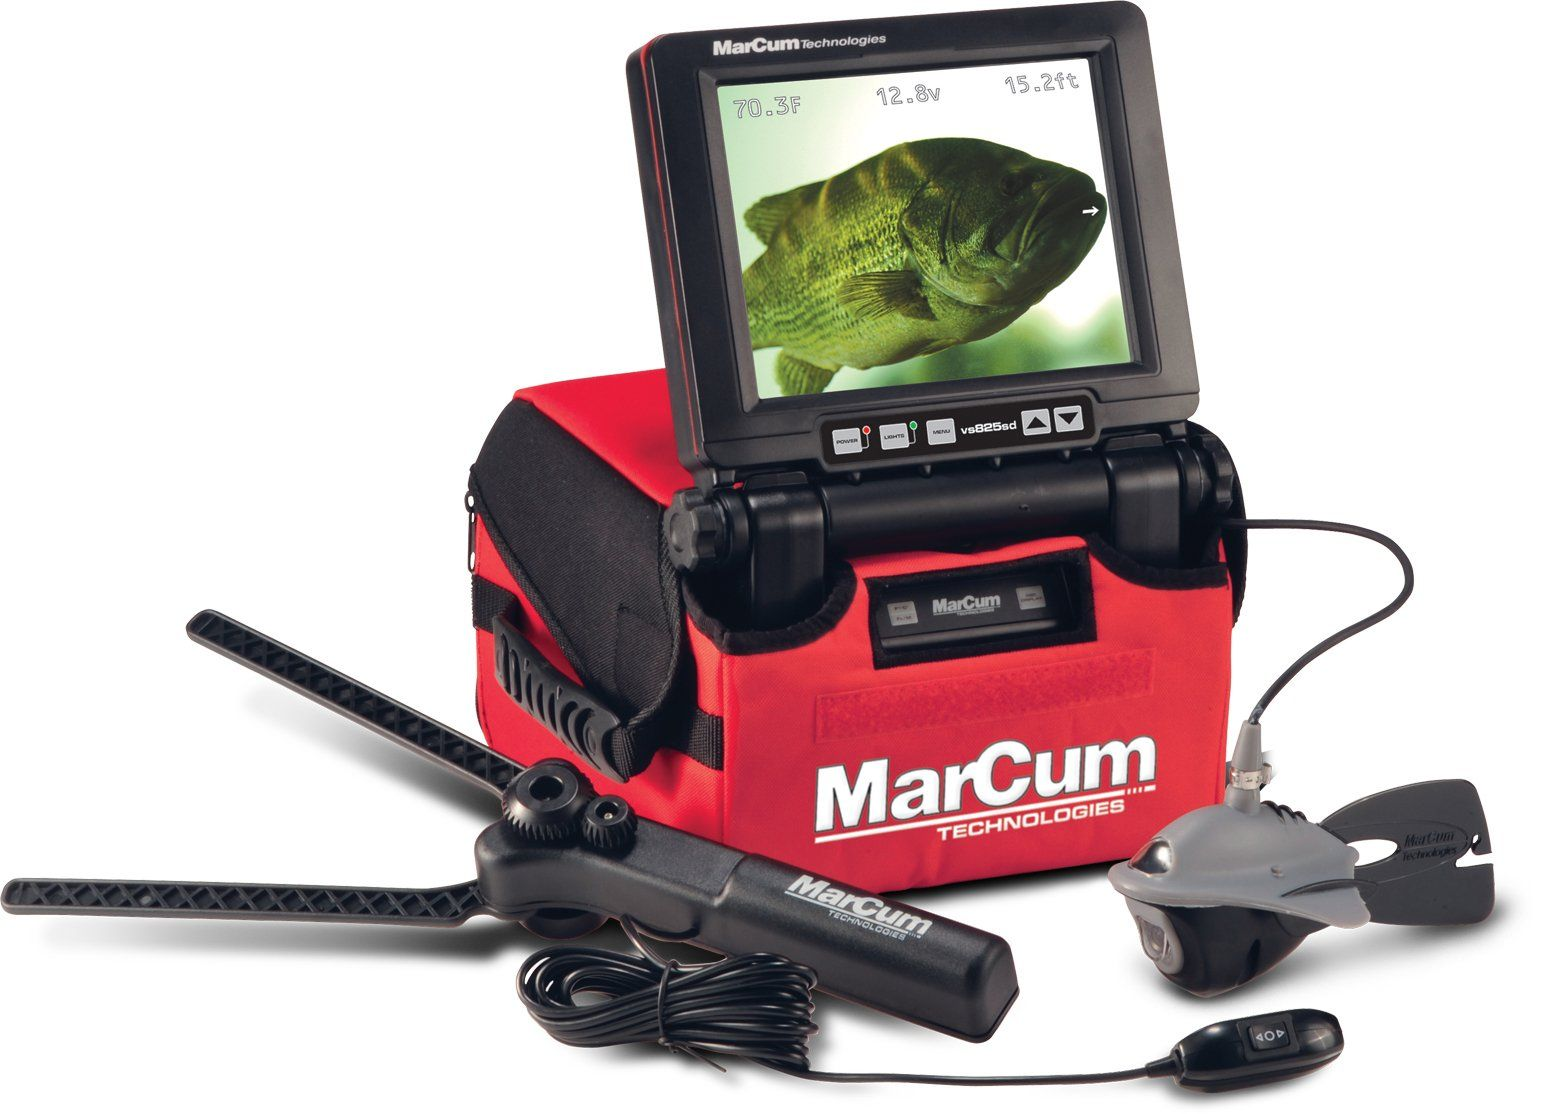 Marcum VS825SD Underwater Camera with 8 inch screen | Fish-Finders ...